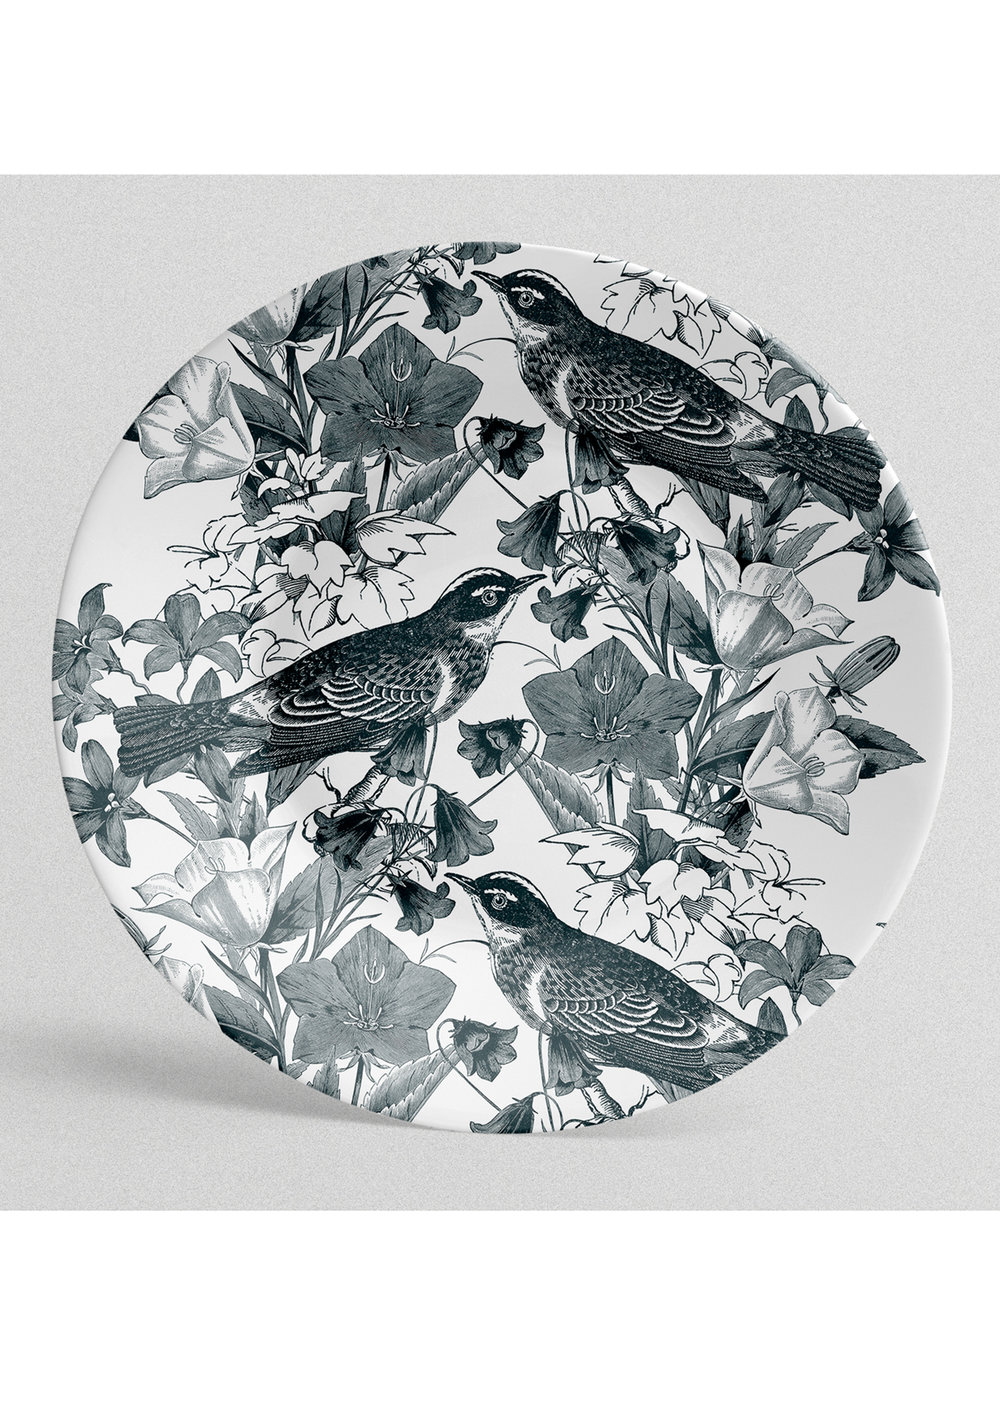 plate01.jpg